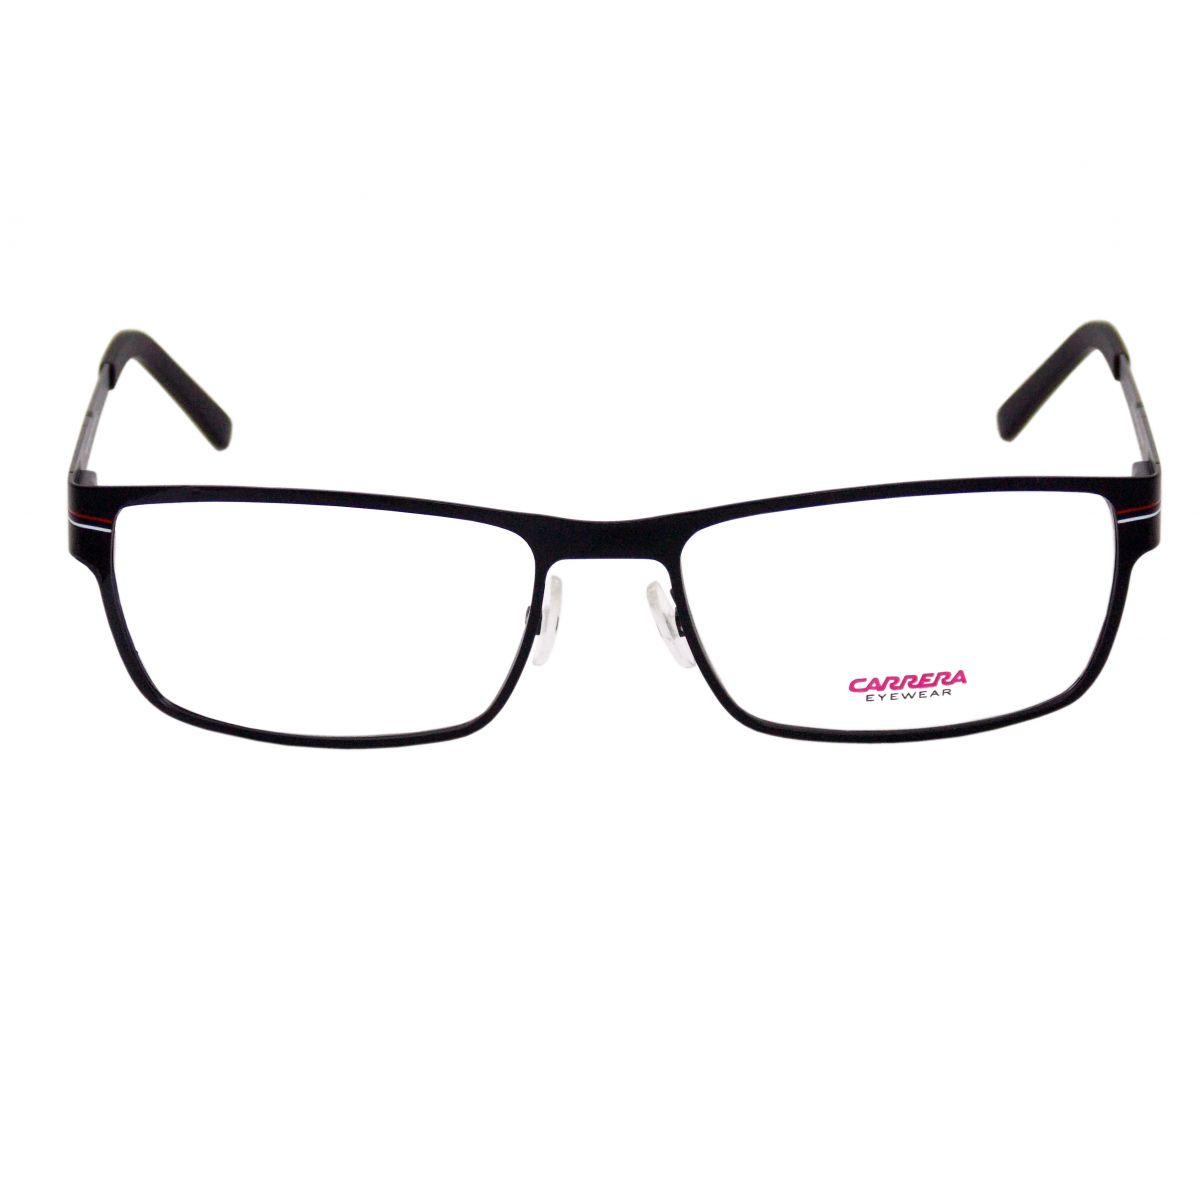 1ff6dfe98b0b5 Óculos De Grau Masculino Carrera CA7582 003 Tam.56Carrera ...